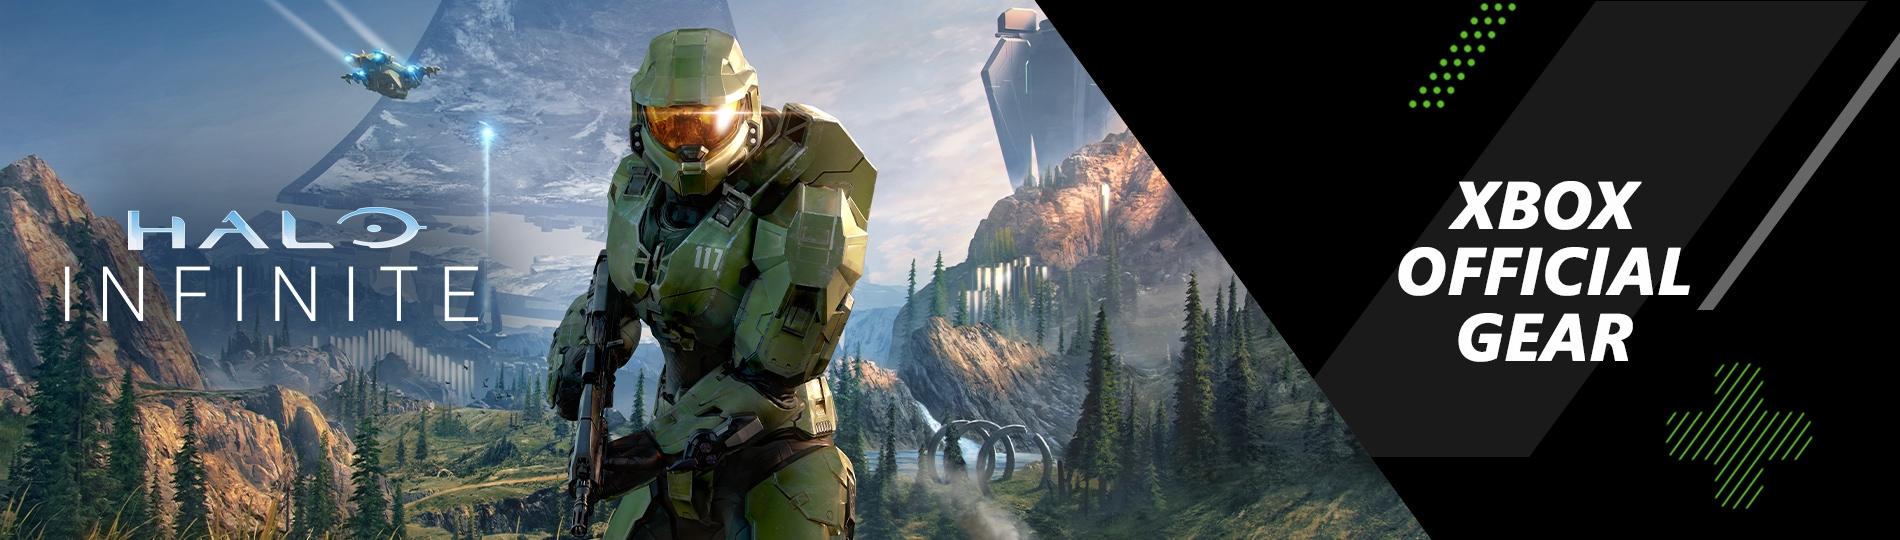 Buy Halo Merchandise - Xbox Official Gear - Microsoft